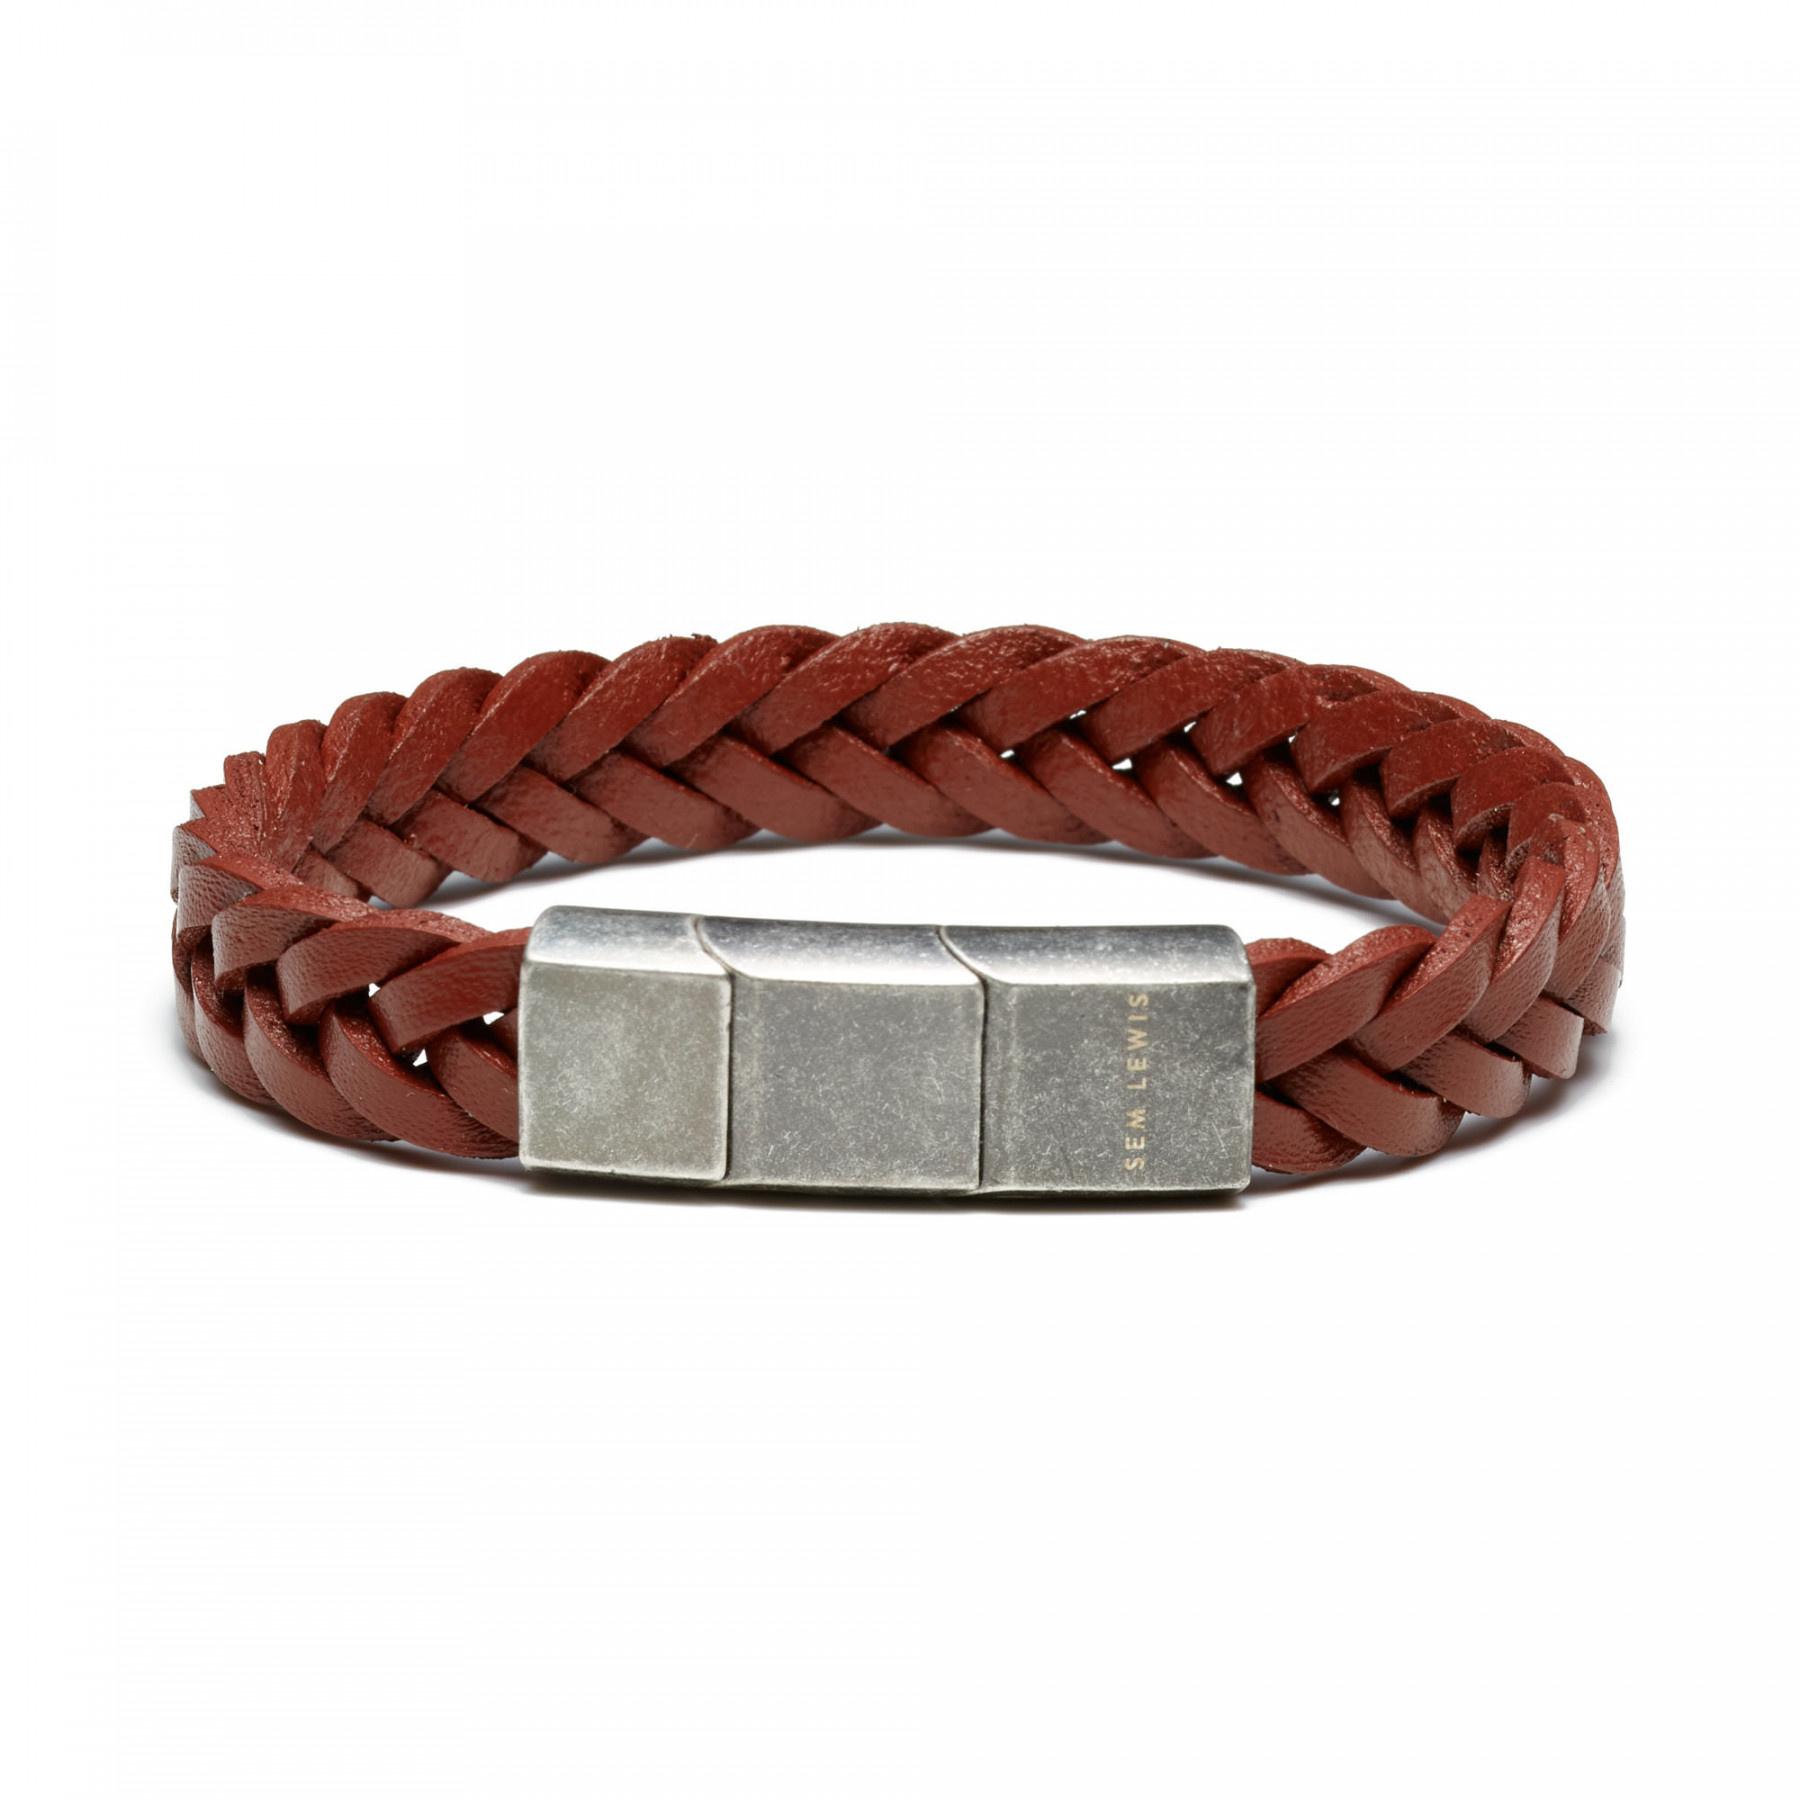 Sem Lewis Bakerloo Paddington braccialetto di pelle marrone